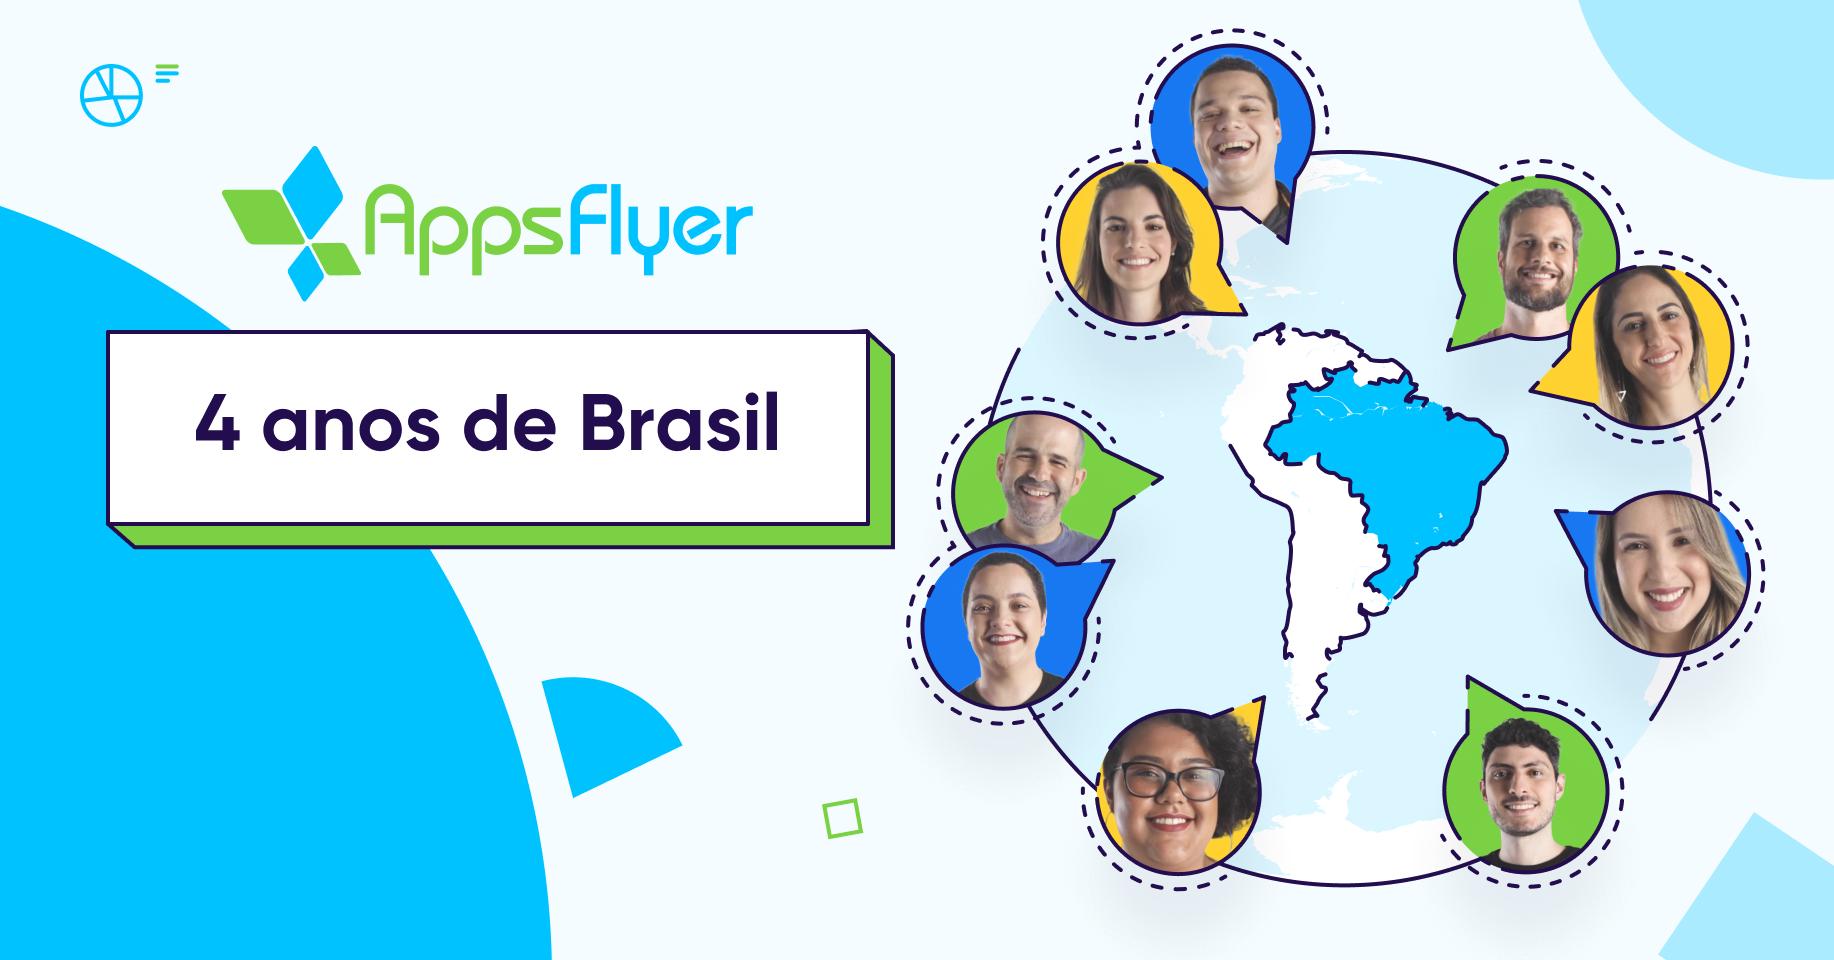 4 anos de appsflyer brasil